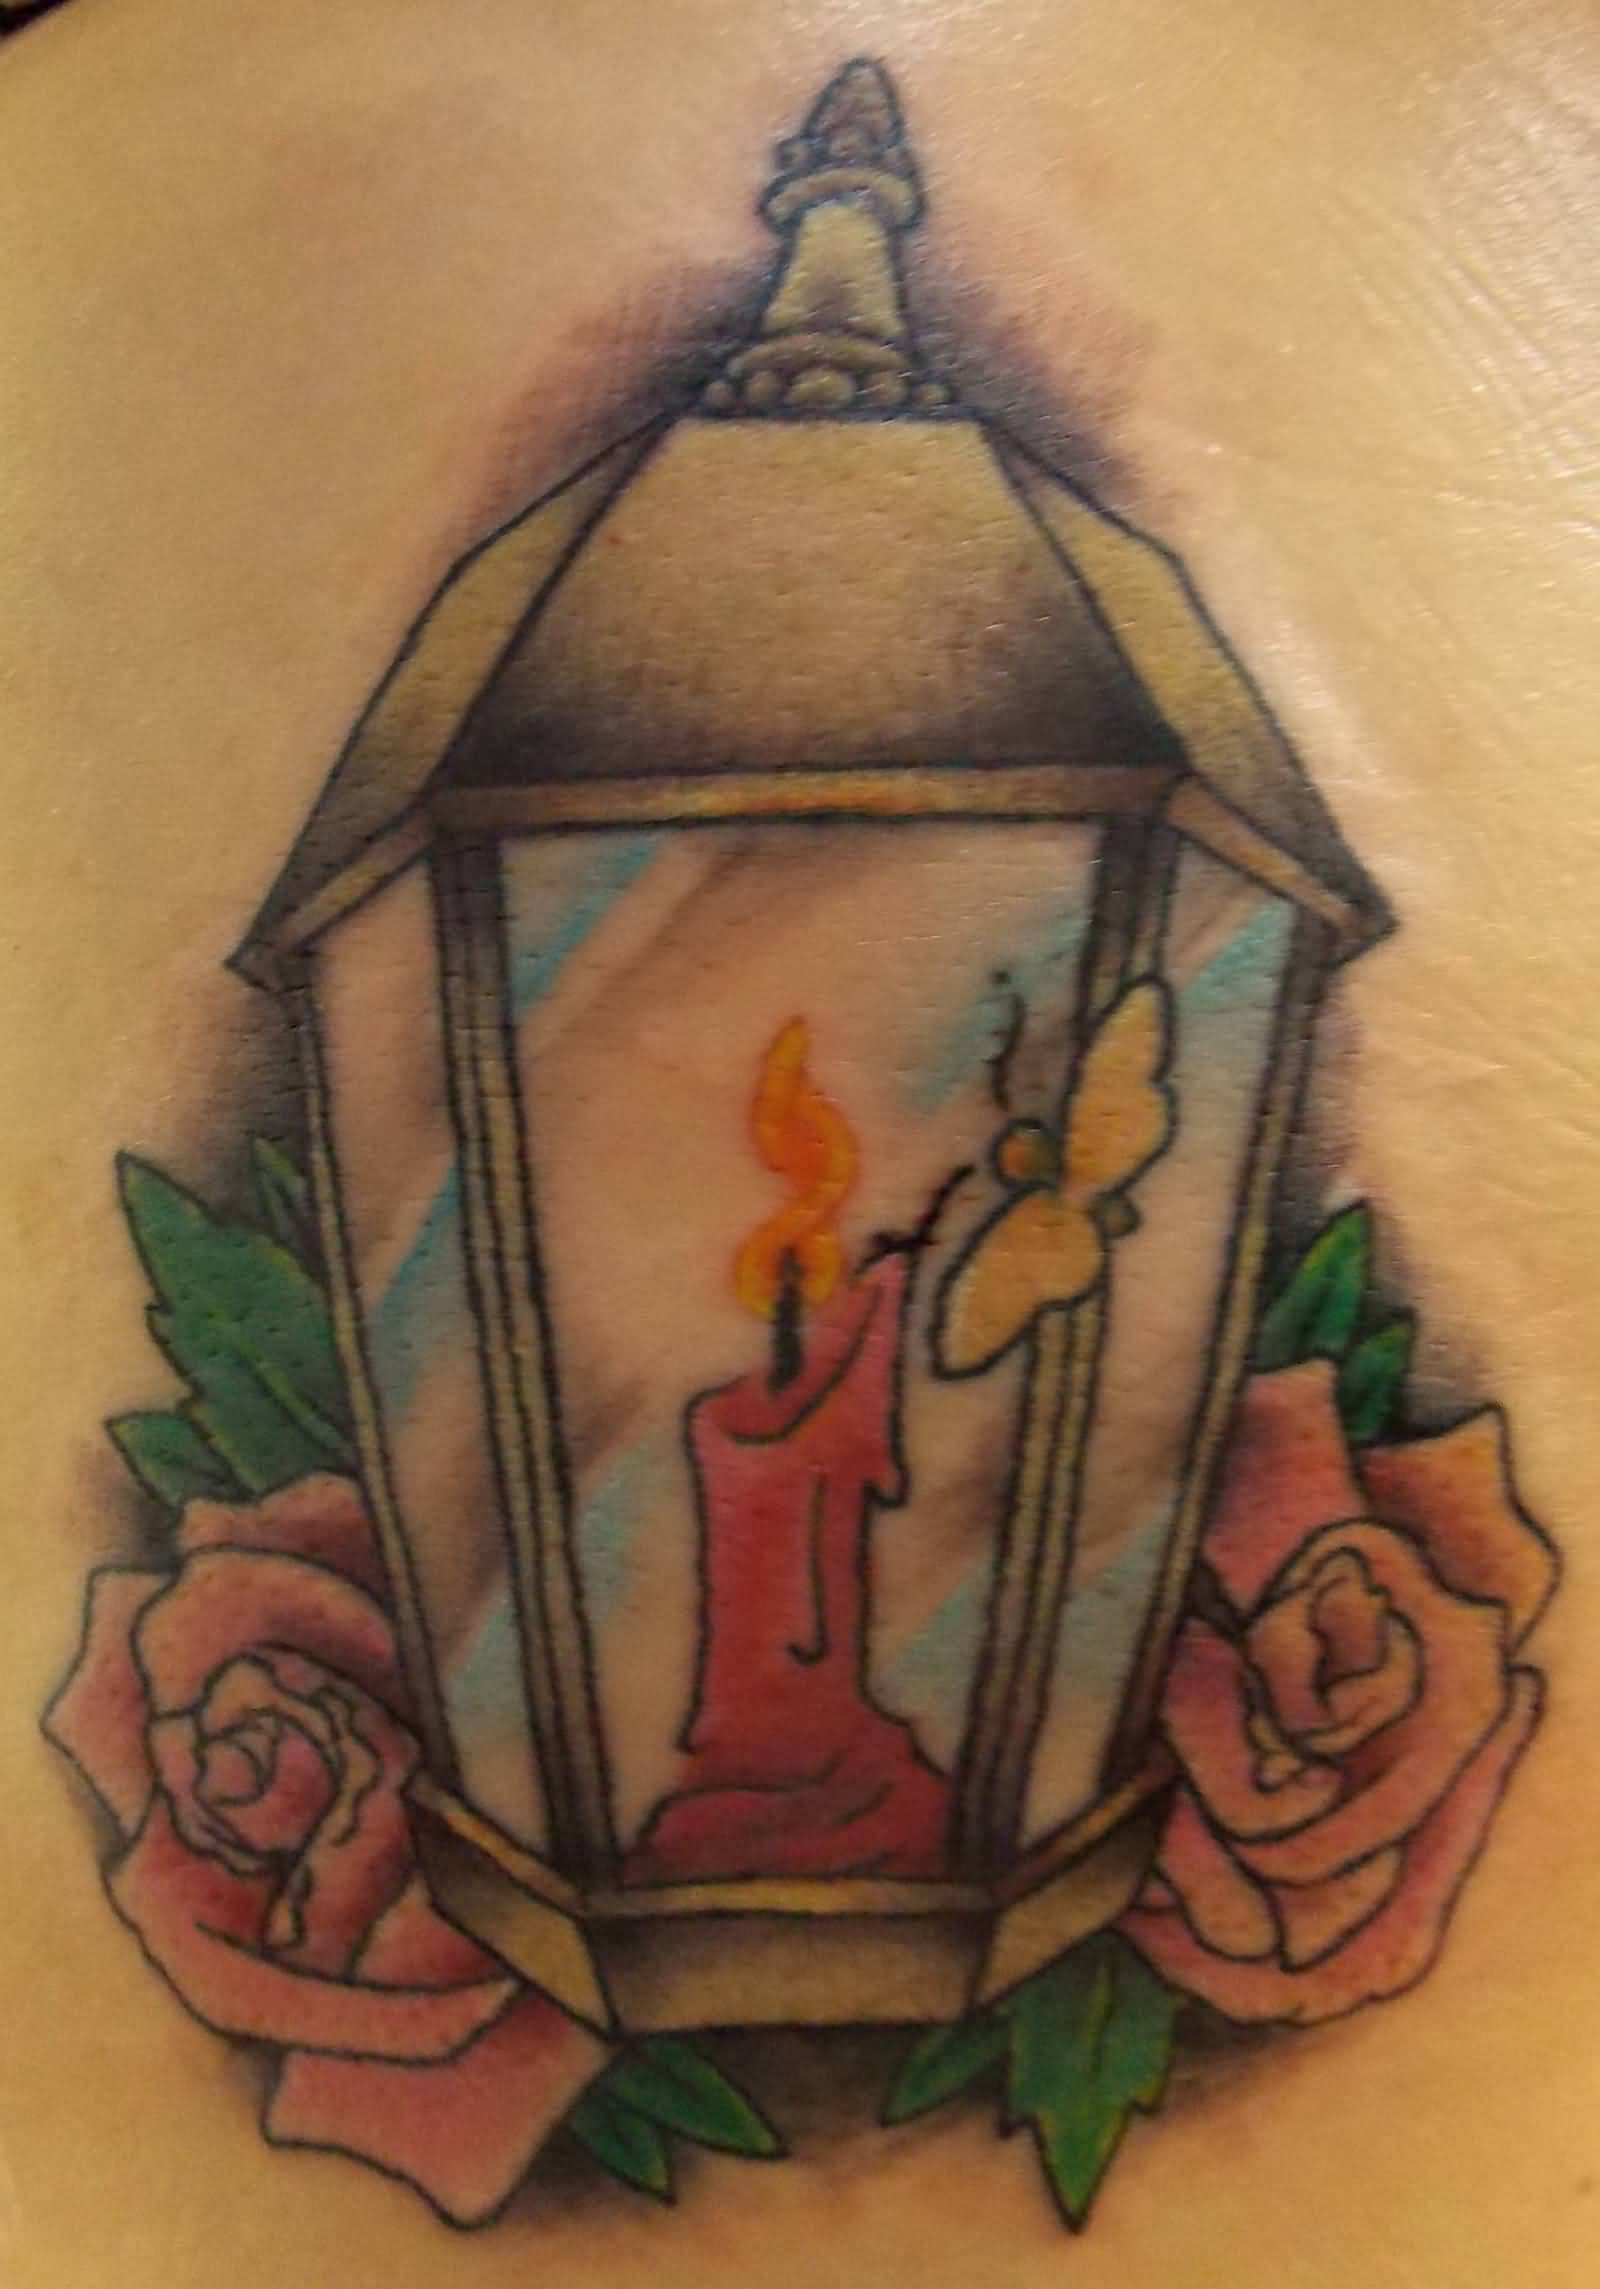 40 Traditional Lantern Tattoos